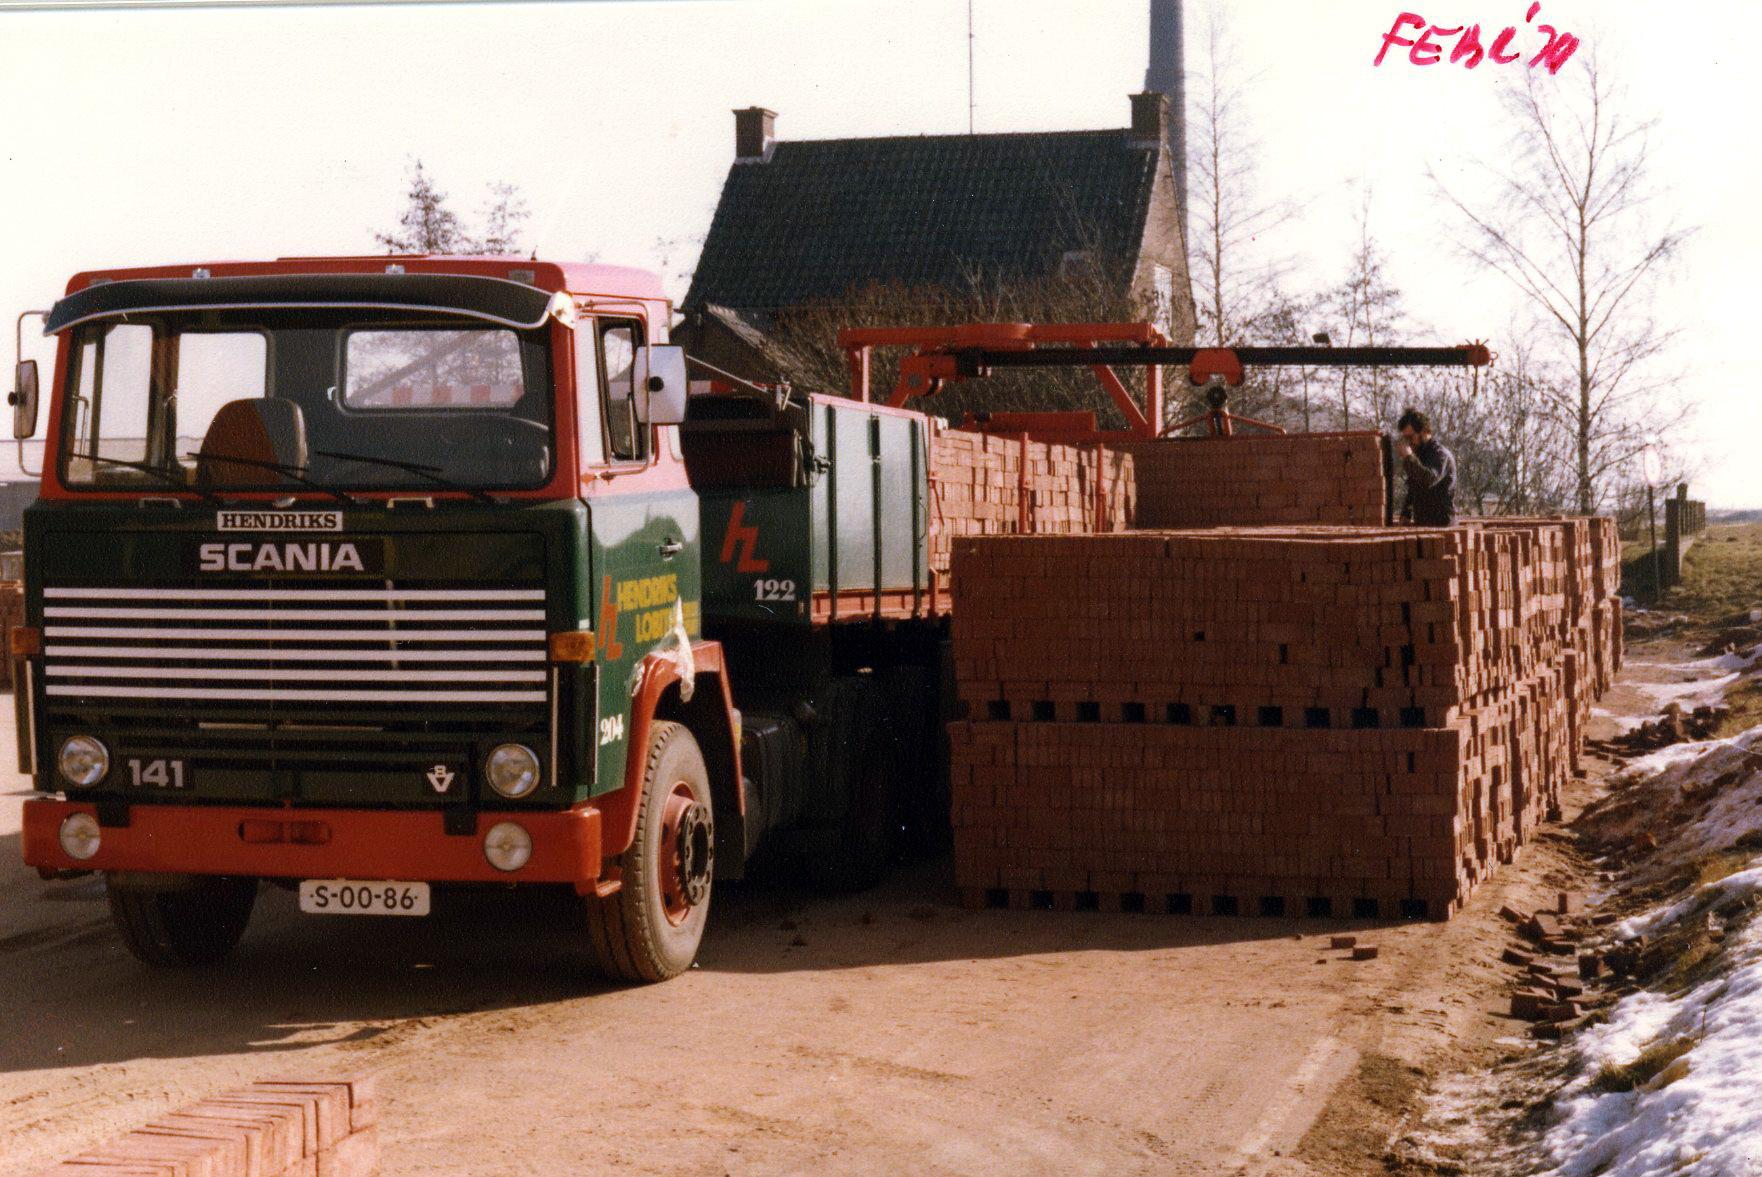 Hendriks-Lobith-Scania-LB141-S0086